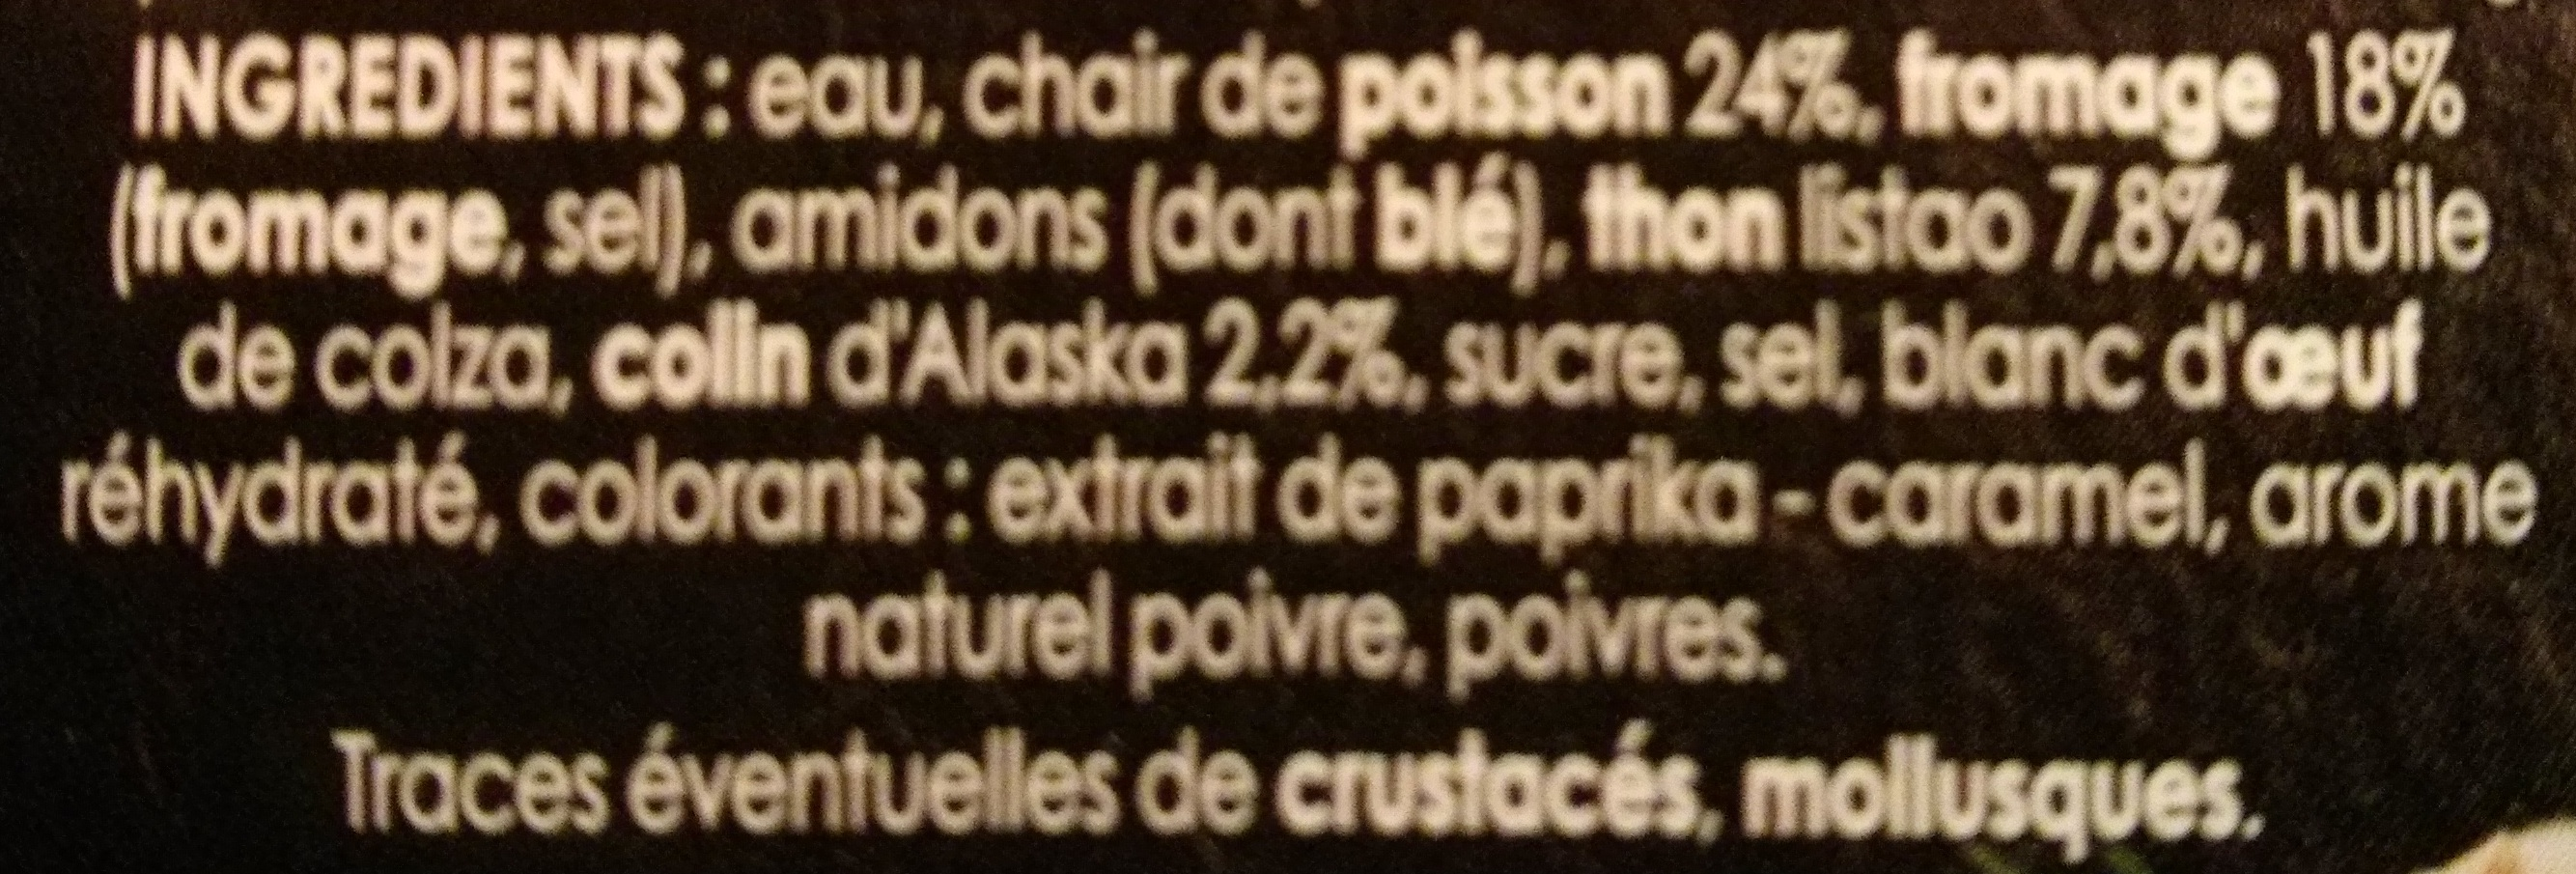 le Gourmand Thon (14 Bâtonnets) - Ingrediënten